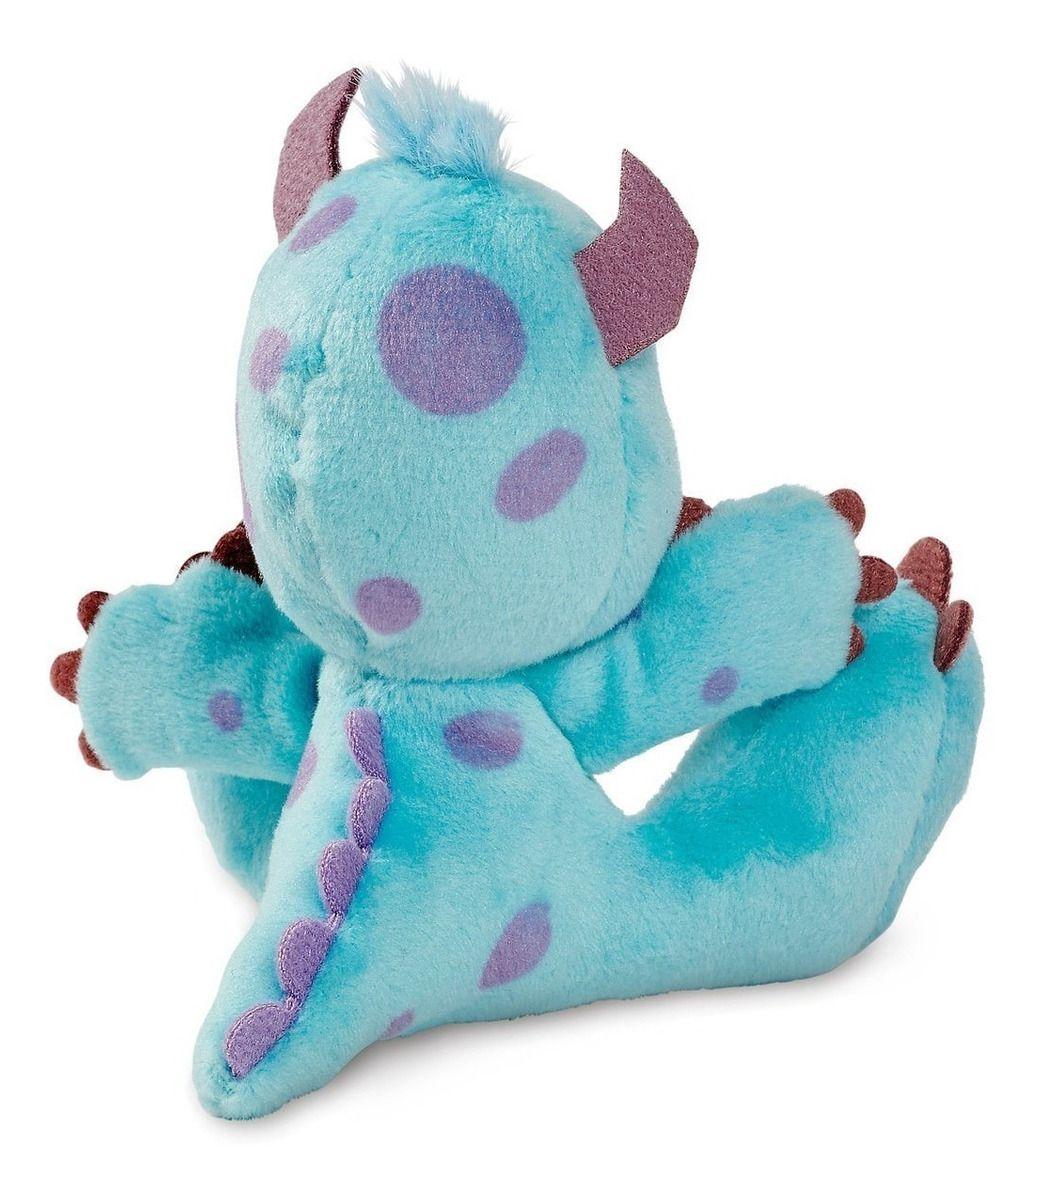 Pelucia Disney Sulley de Monstros S/A Sullivan Disney Tiny Big Feet Parks Disney  - Game Land Brinquedos